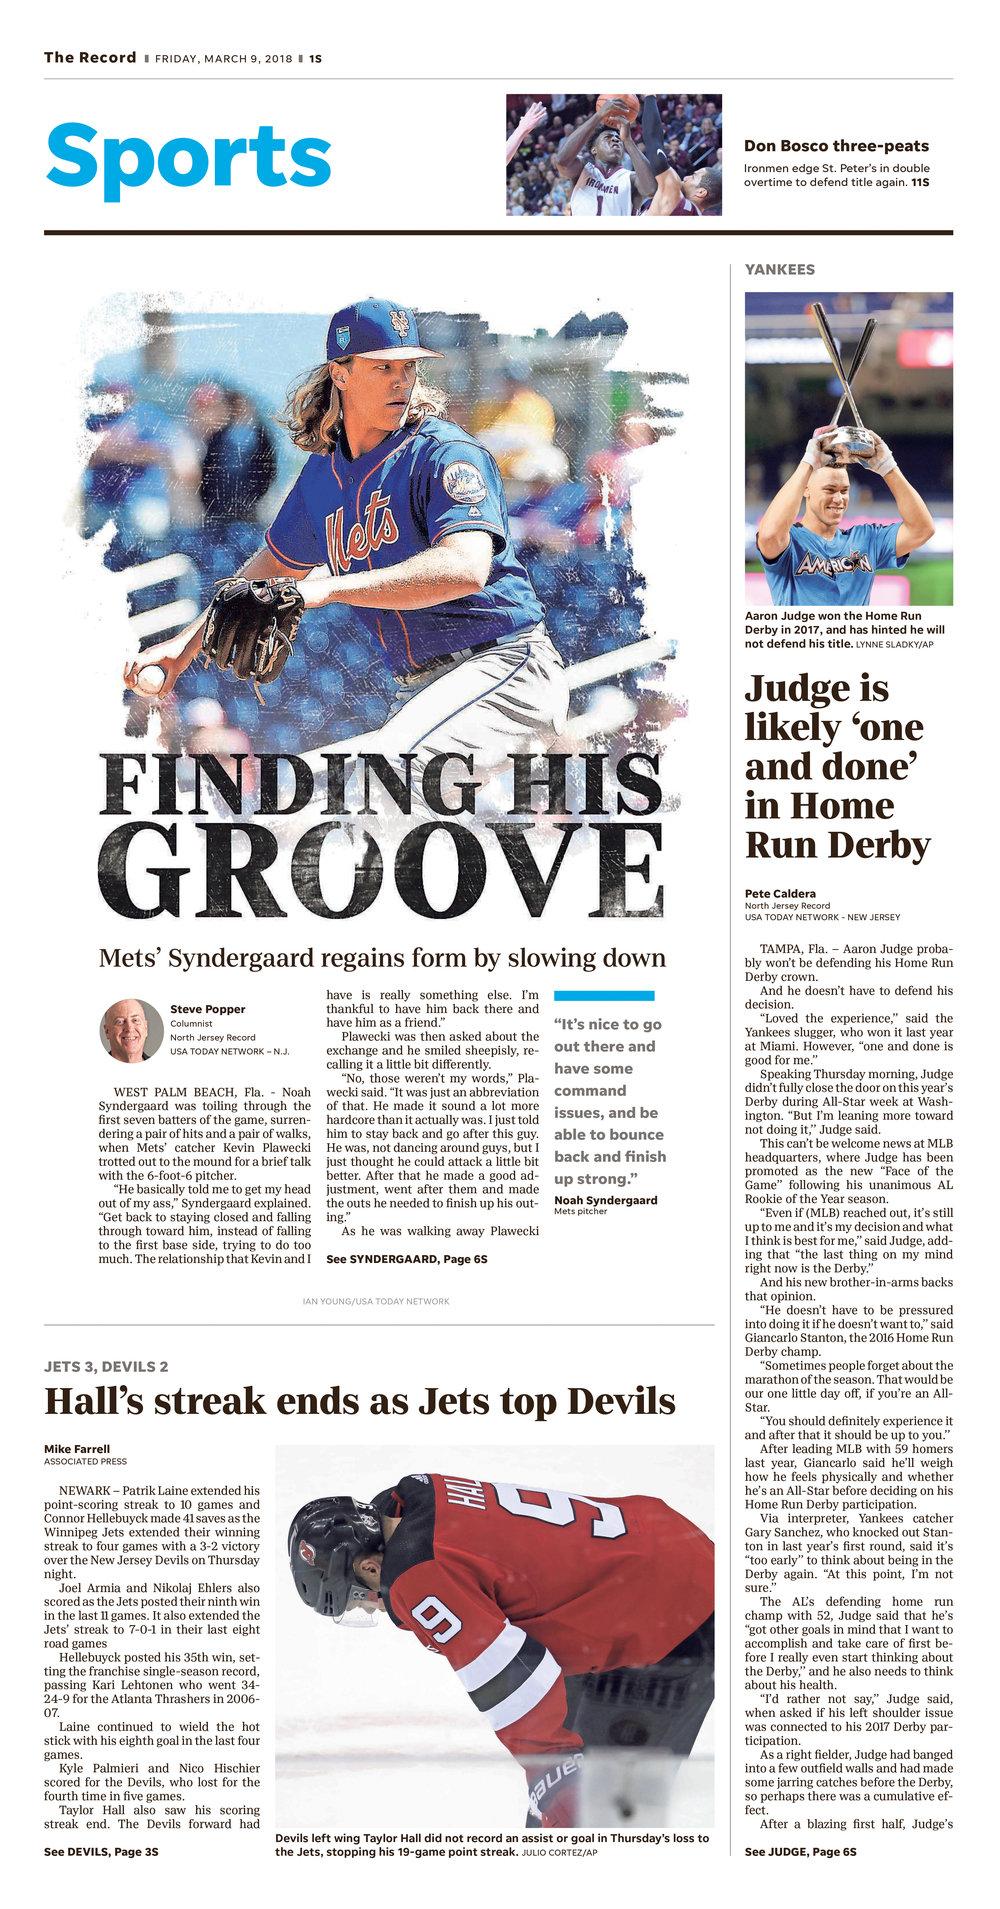 Sports-Cov, BER1Brd 03-09-2018, HeraldNews 1 - Sports.jpg